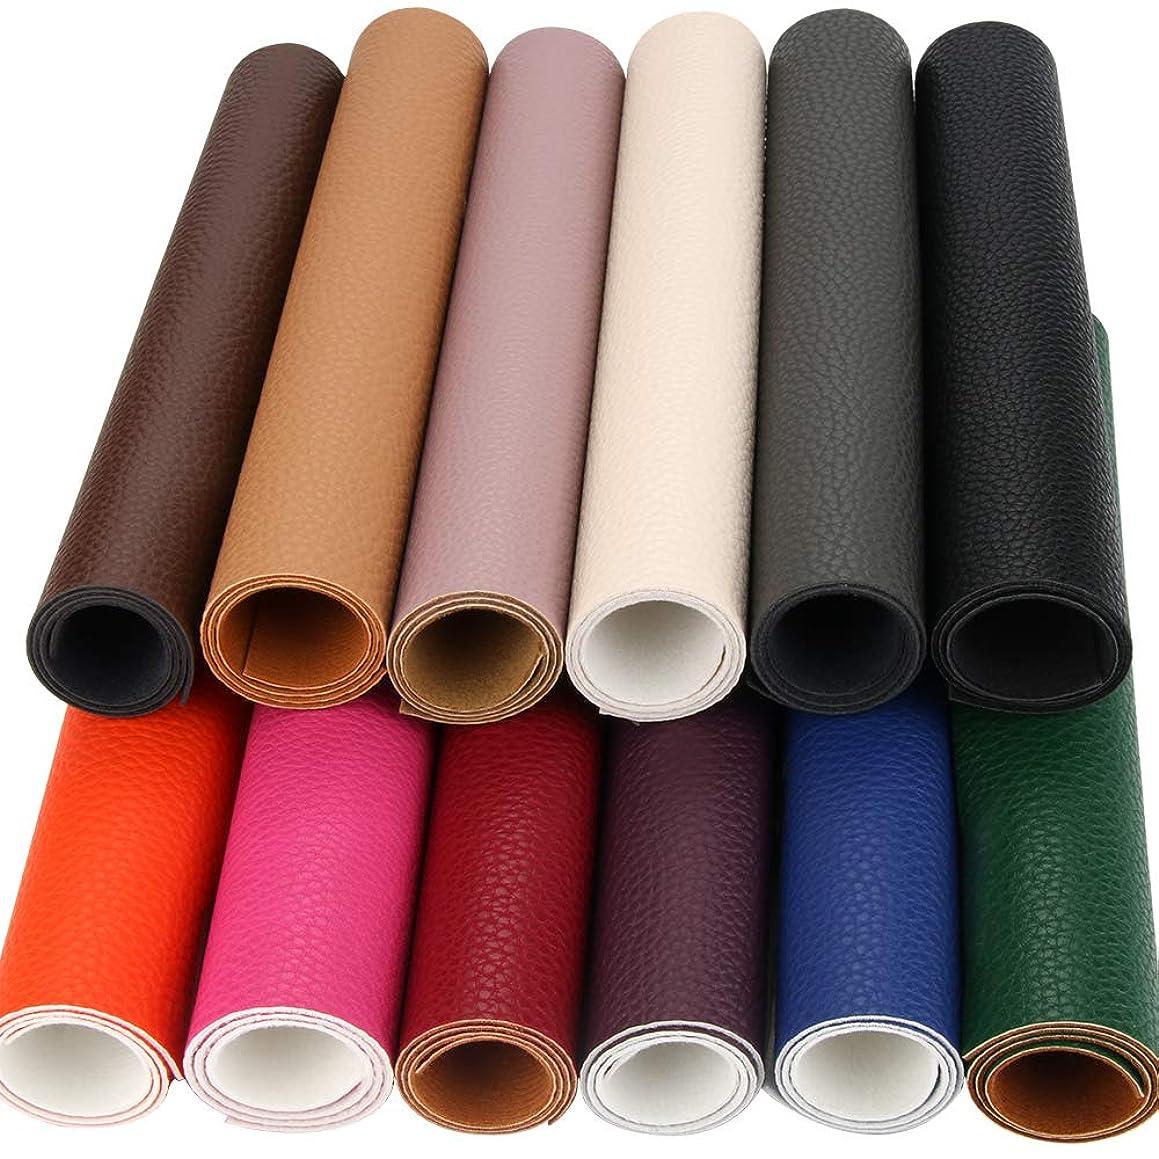 12 PCS PU Leather Fabric Leather Canvas Back 8